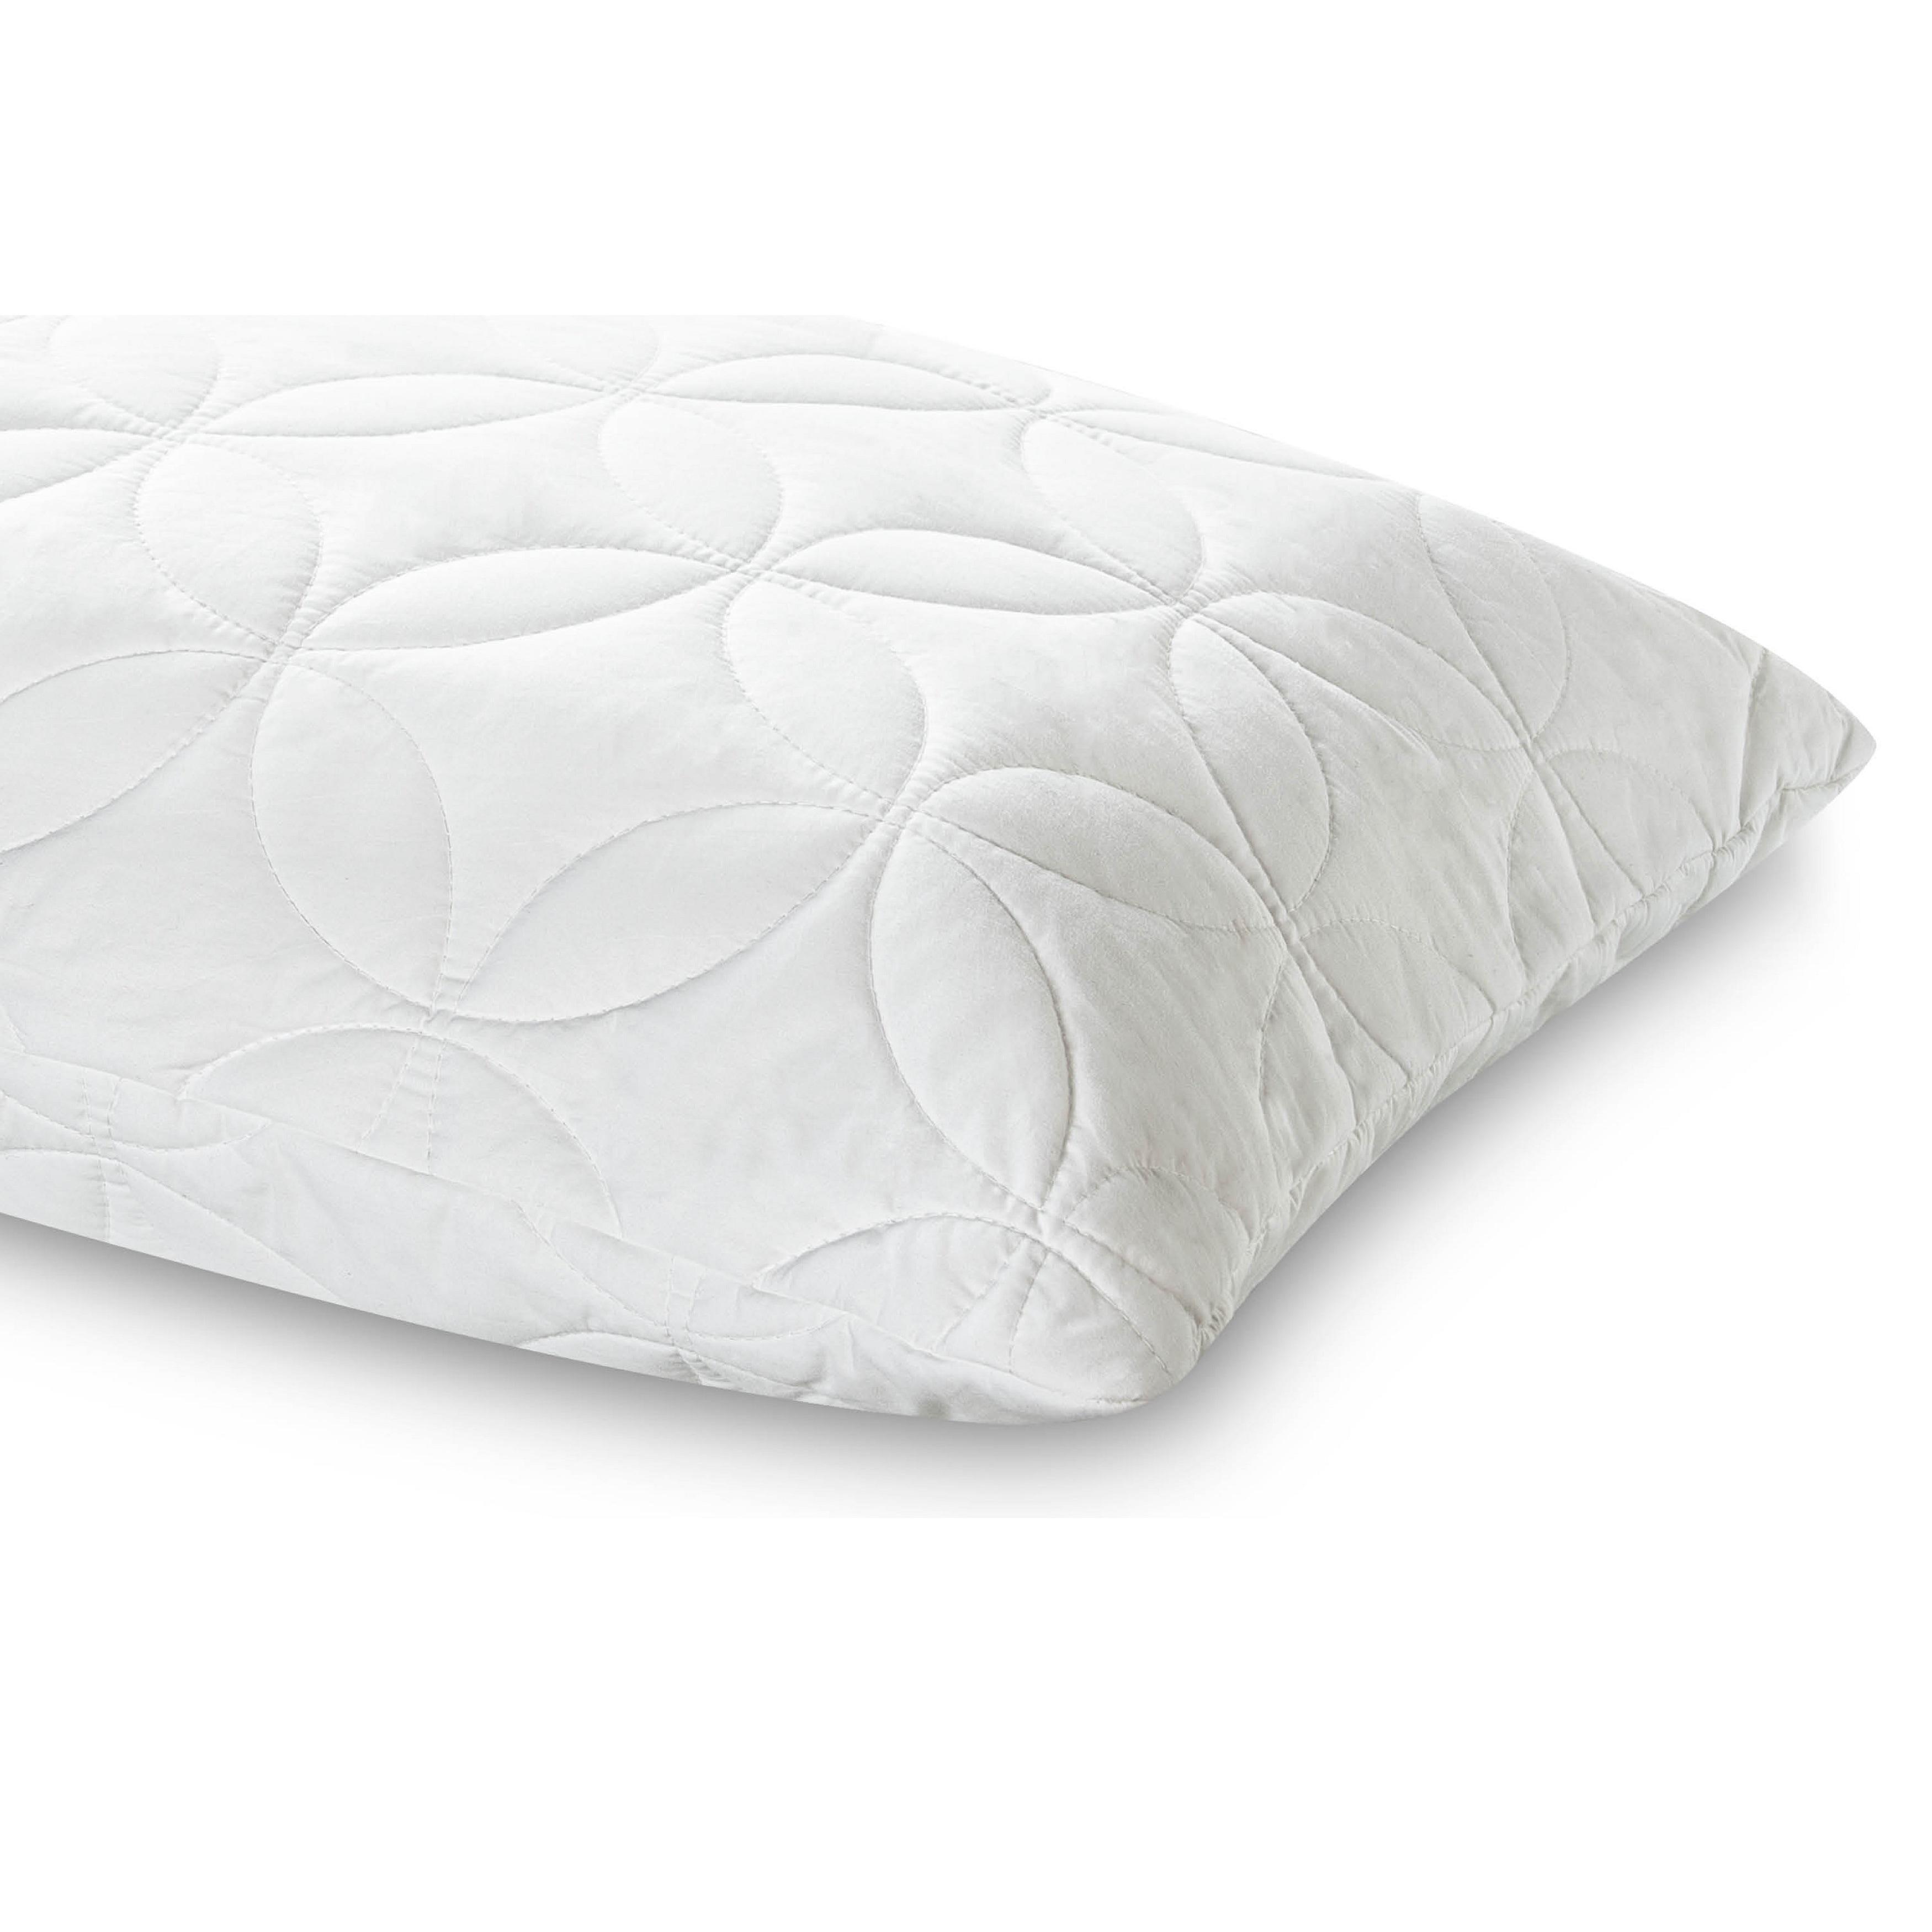 Cuscino Tempur Comfort Cloud.Shop Tempur Cloud Soft And Conforming Memory Foam Pillow Overstock 16394498